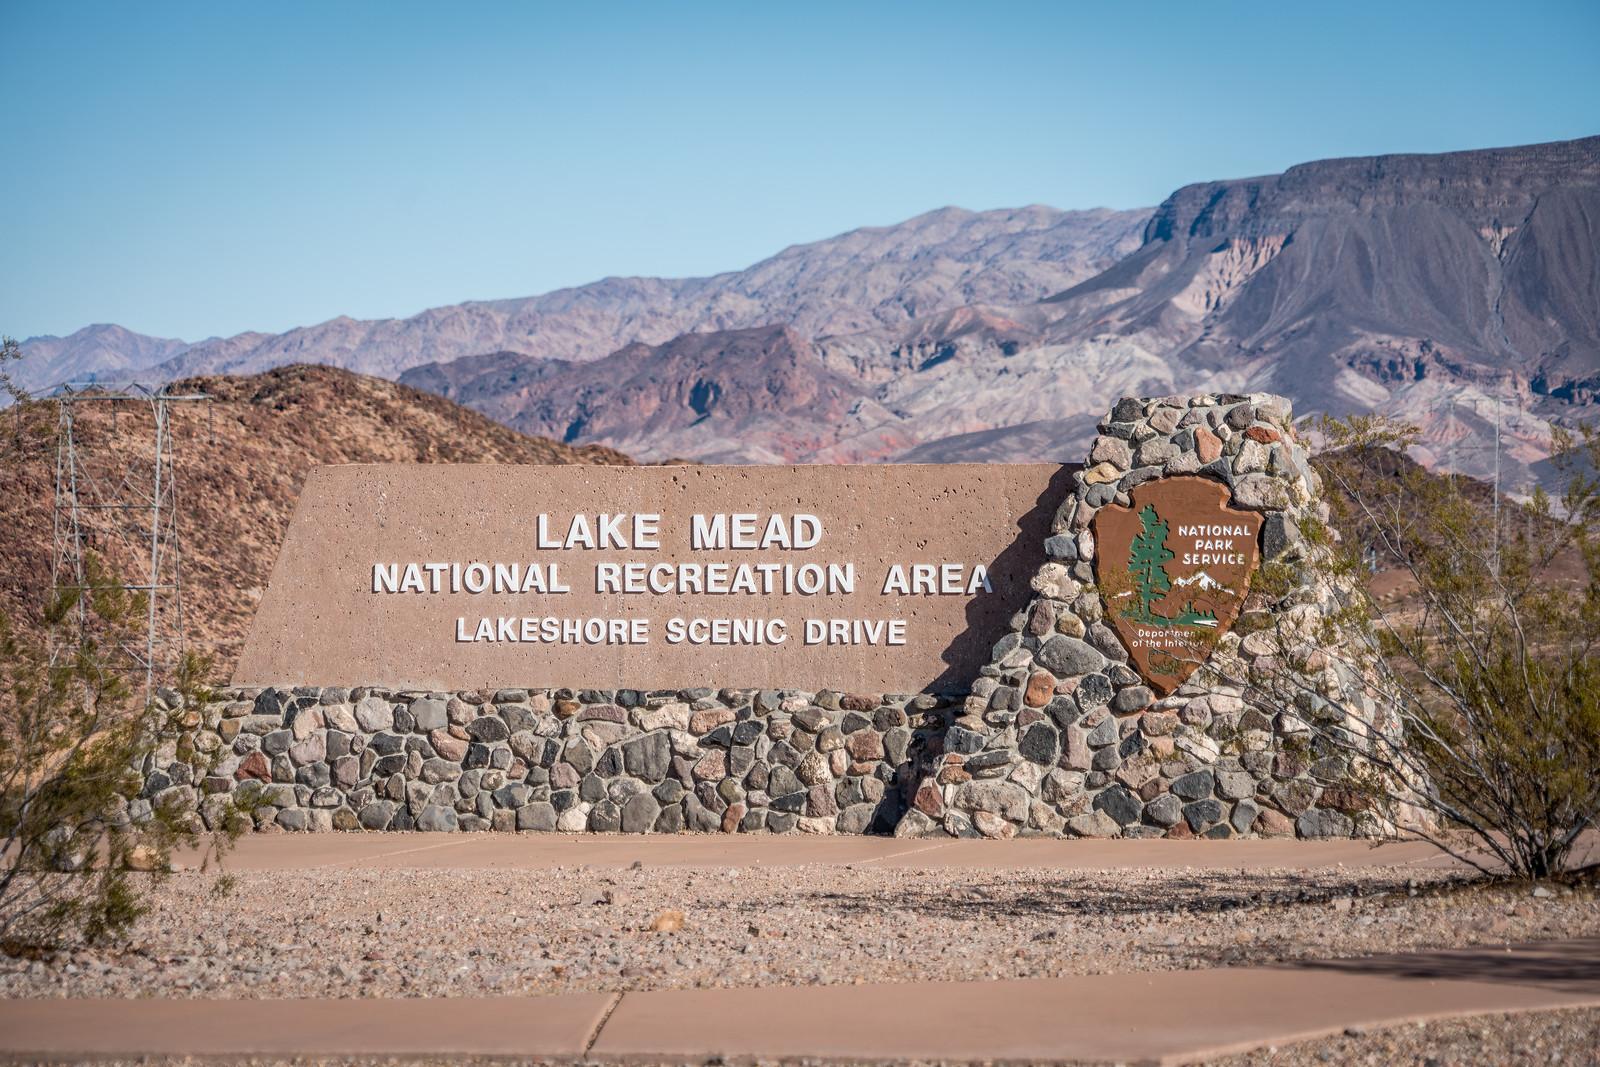 Lake Mead National Recreation Area, Nevada/Arizona